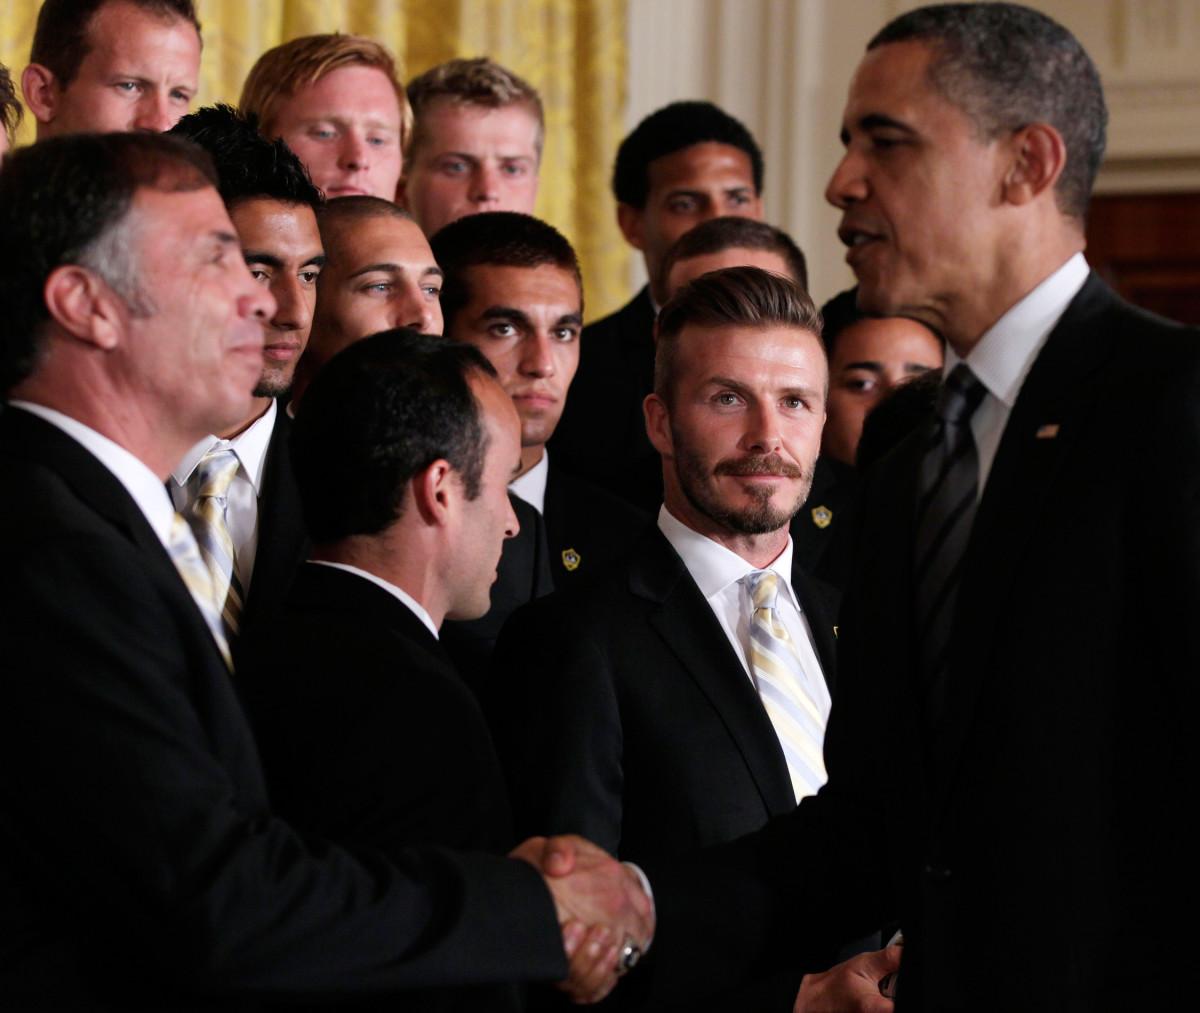 Bruce-Obama-Gallery.jpg